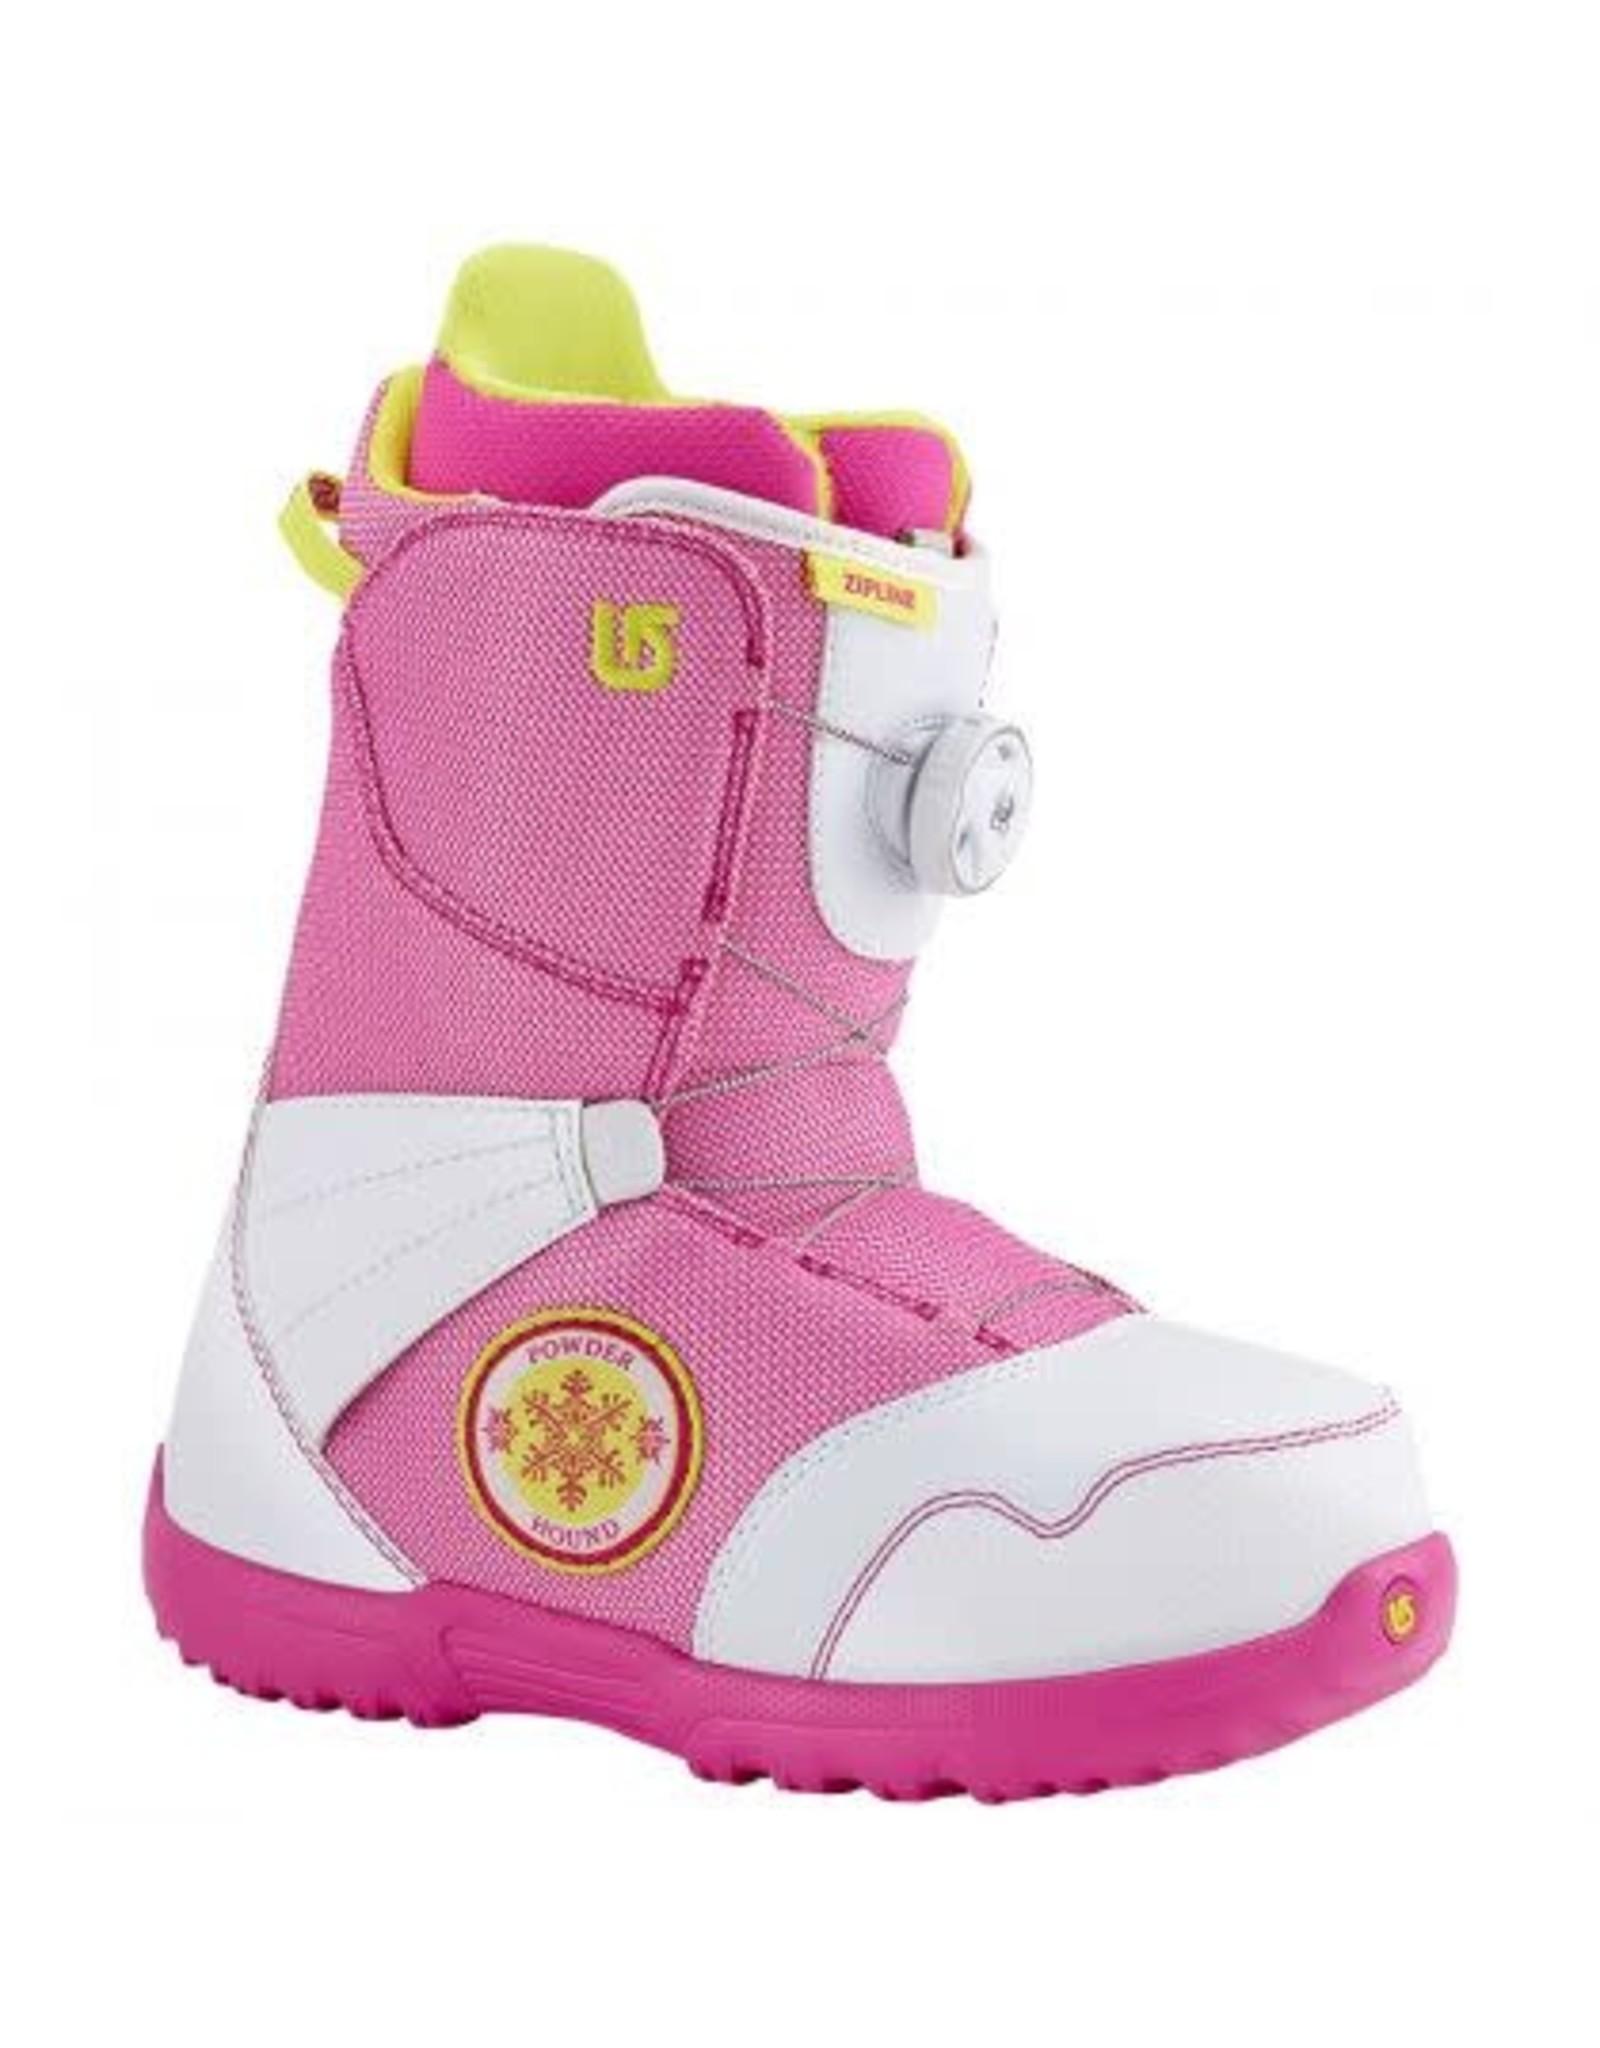 Burton Burton Zipline Boa Boot 7K Pink/White F15